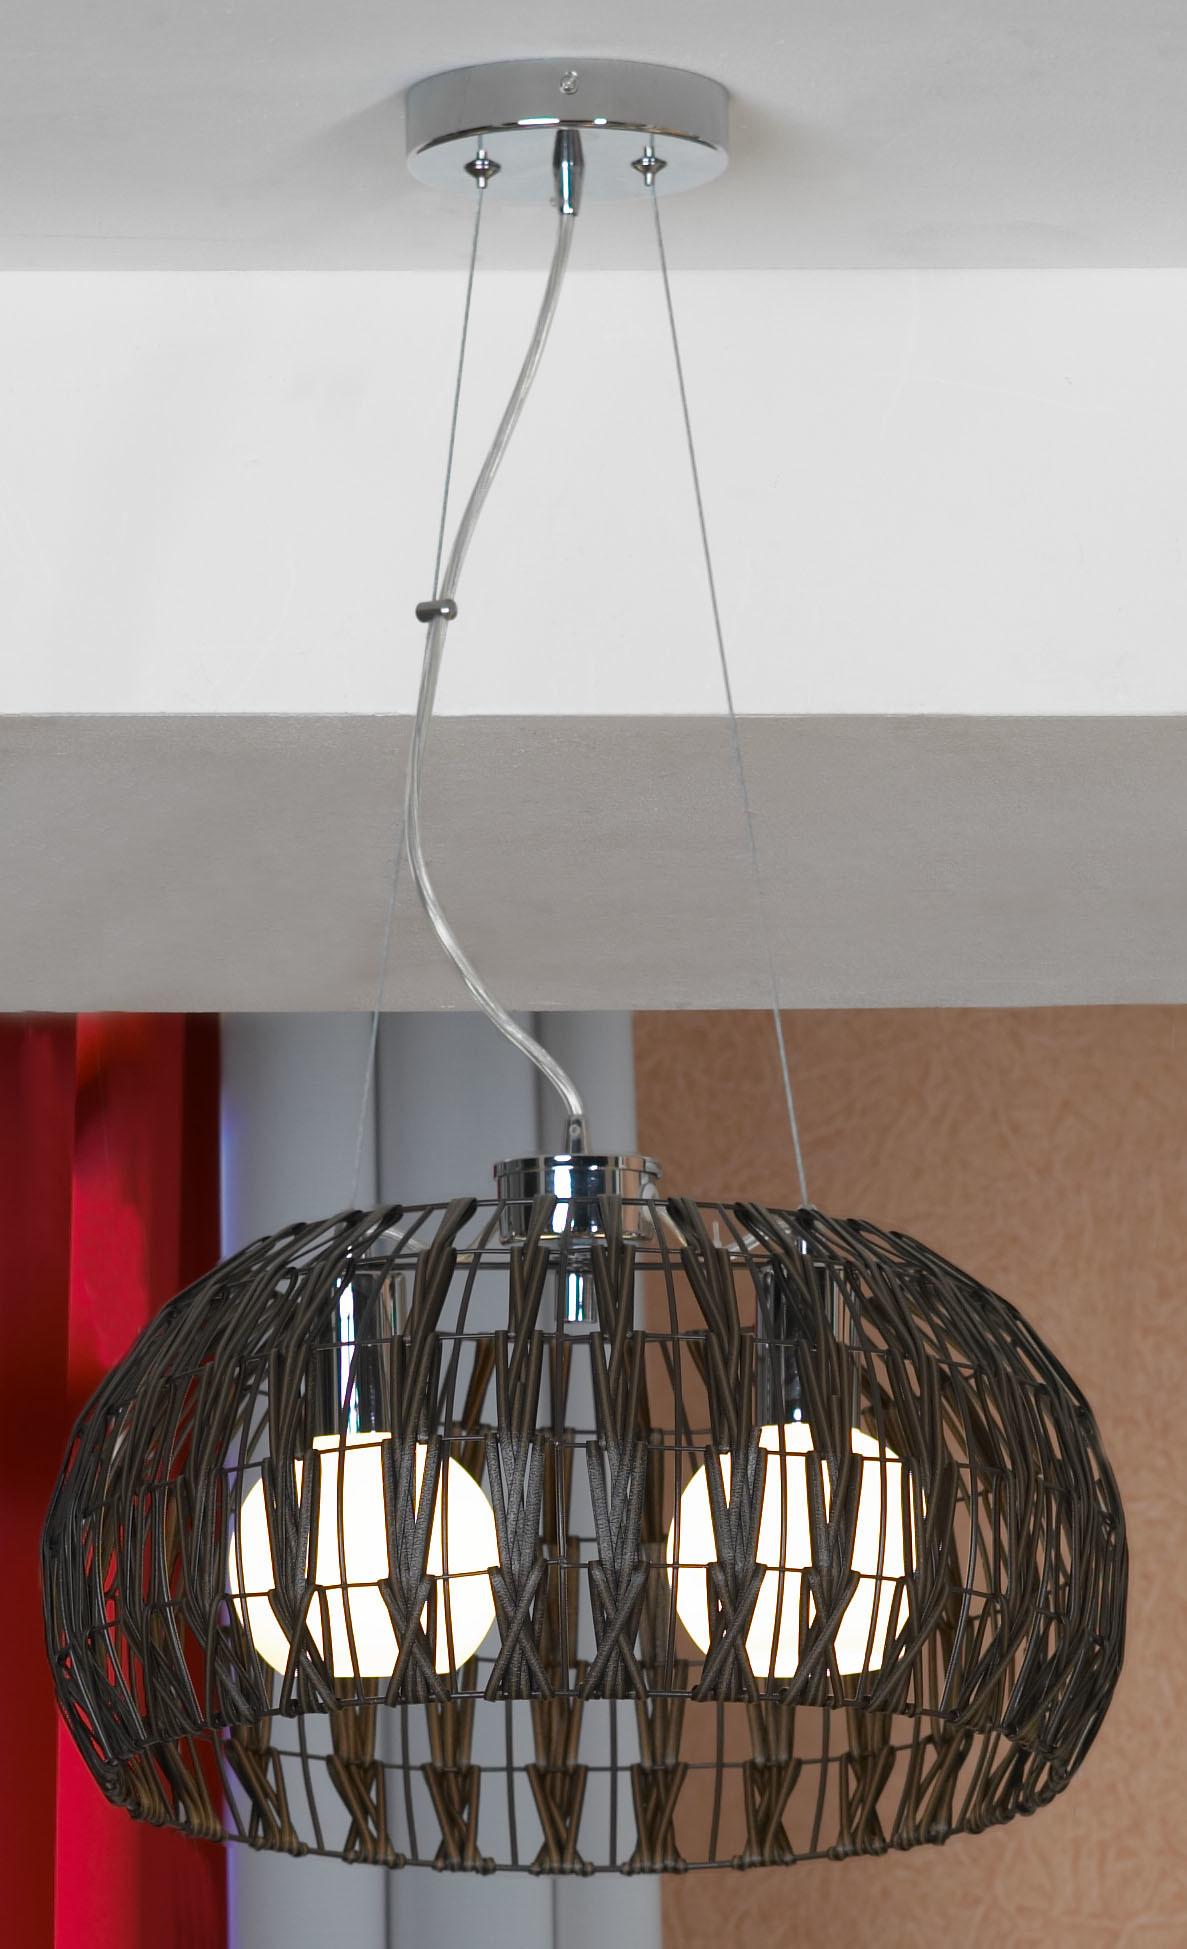 Подвесной светильник Lussole Fenigli LSX-4173-02, IP21, 2xE27x60W, хром, коричневый, металл, пластик - фото 1